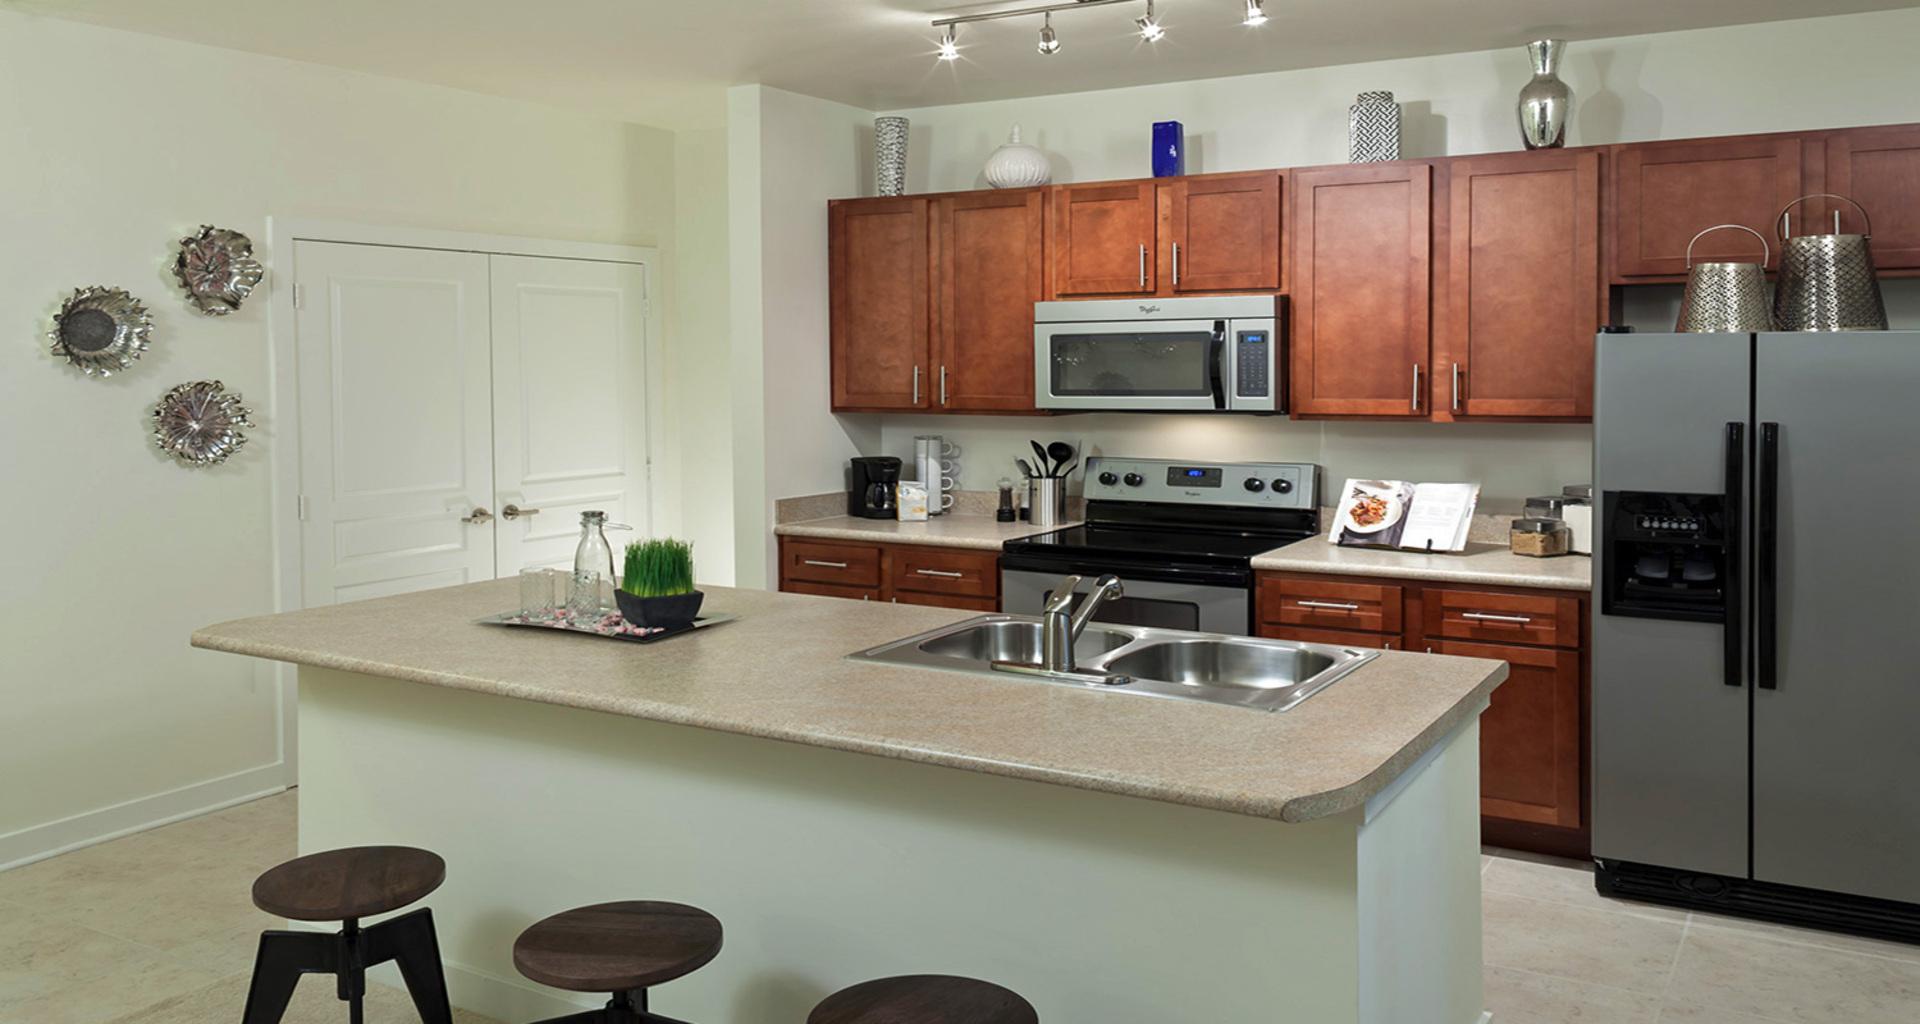 River Oaks Luxury Apartment Homes in Woodbridge VA